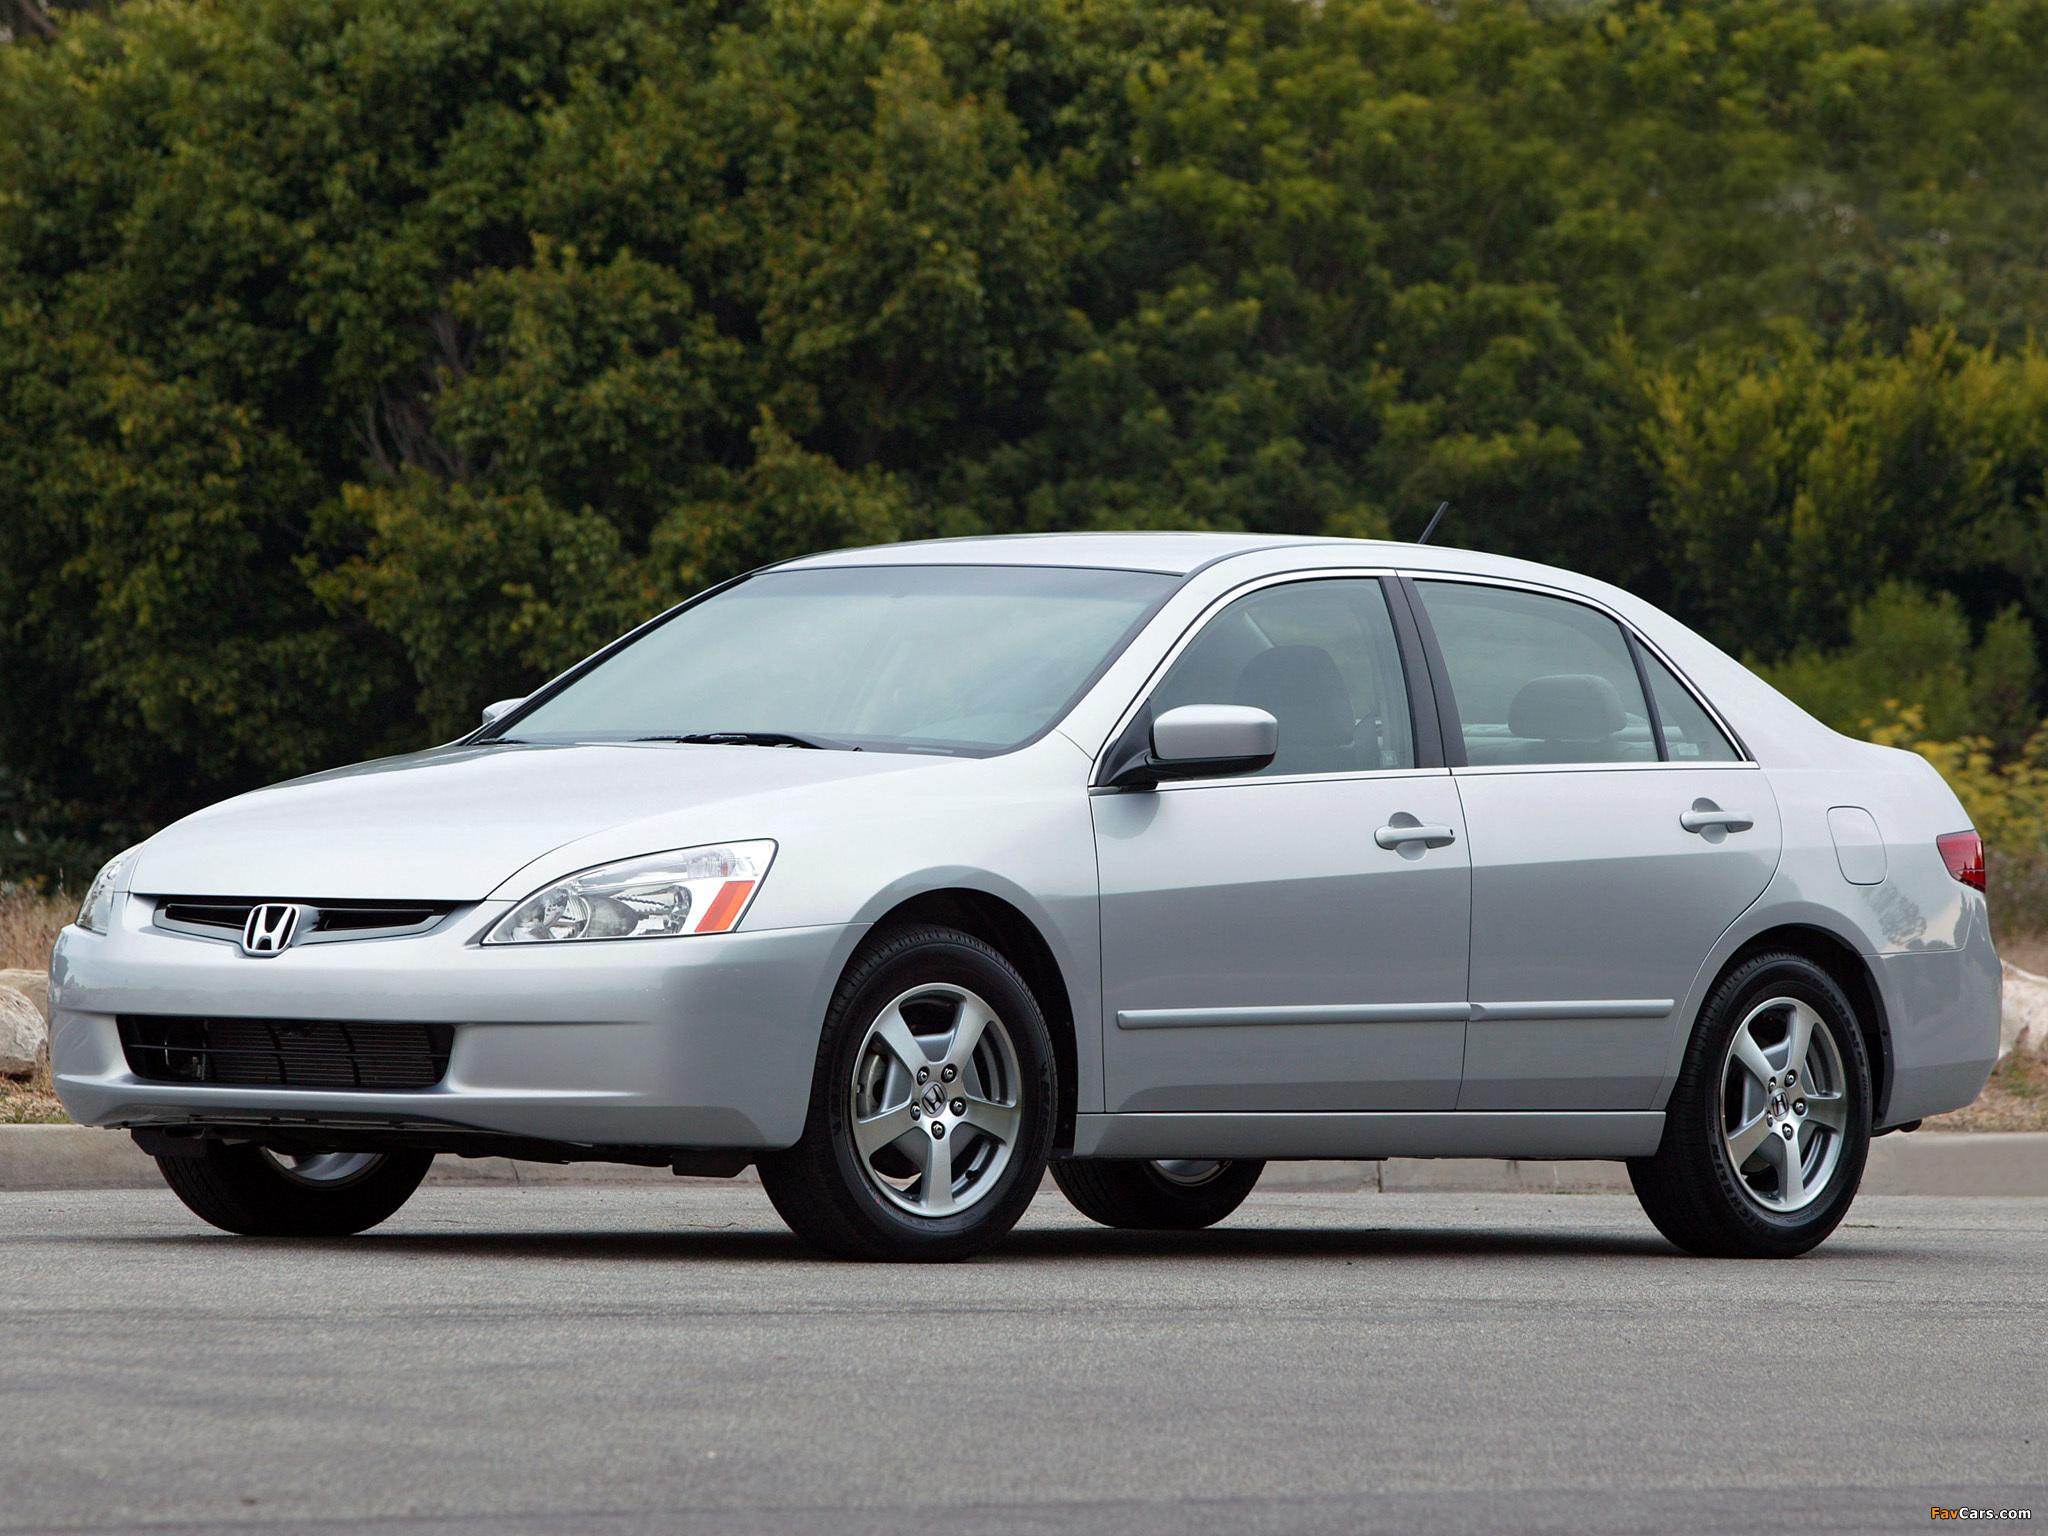 Honda Accord Hybrid Us Spec 2005 06 Images 2048x1536